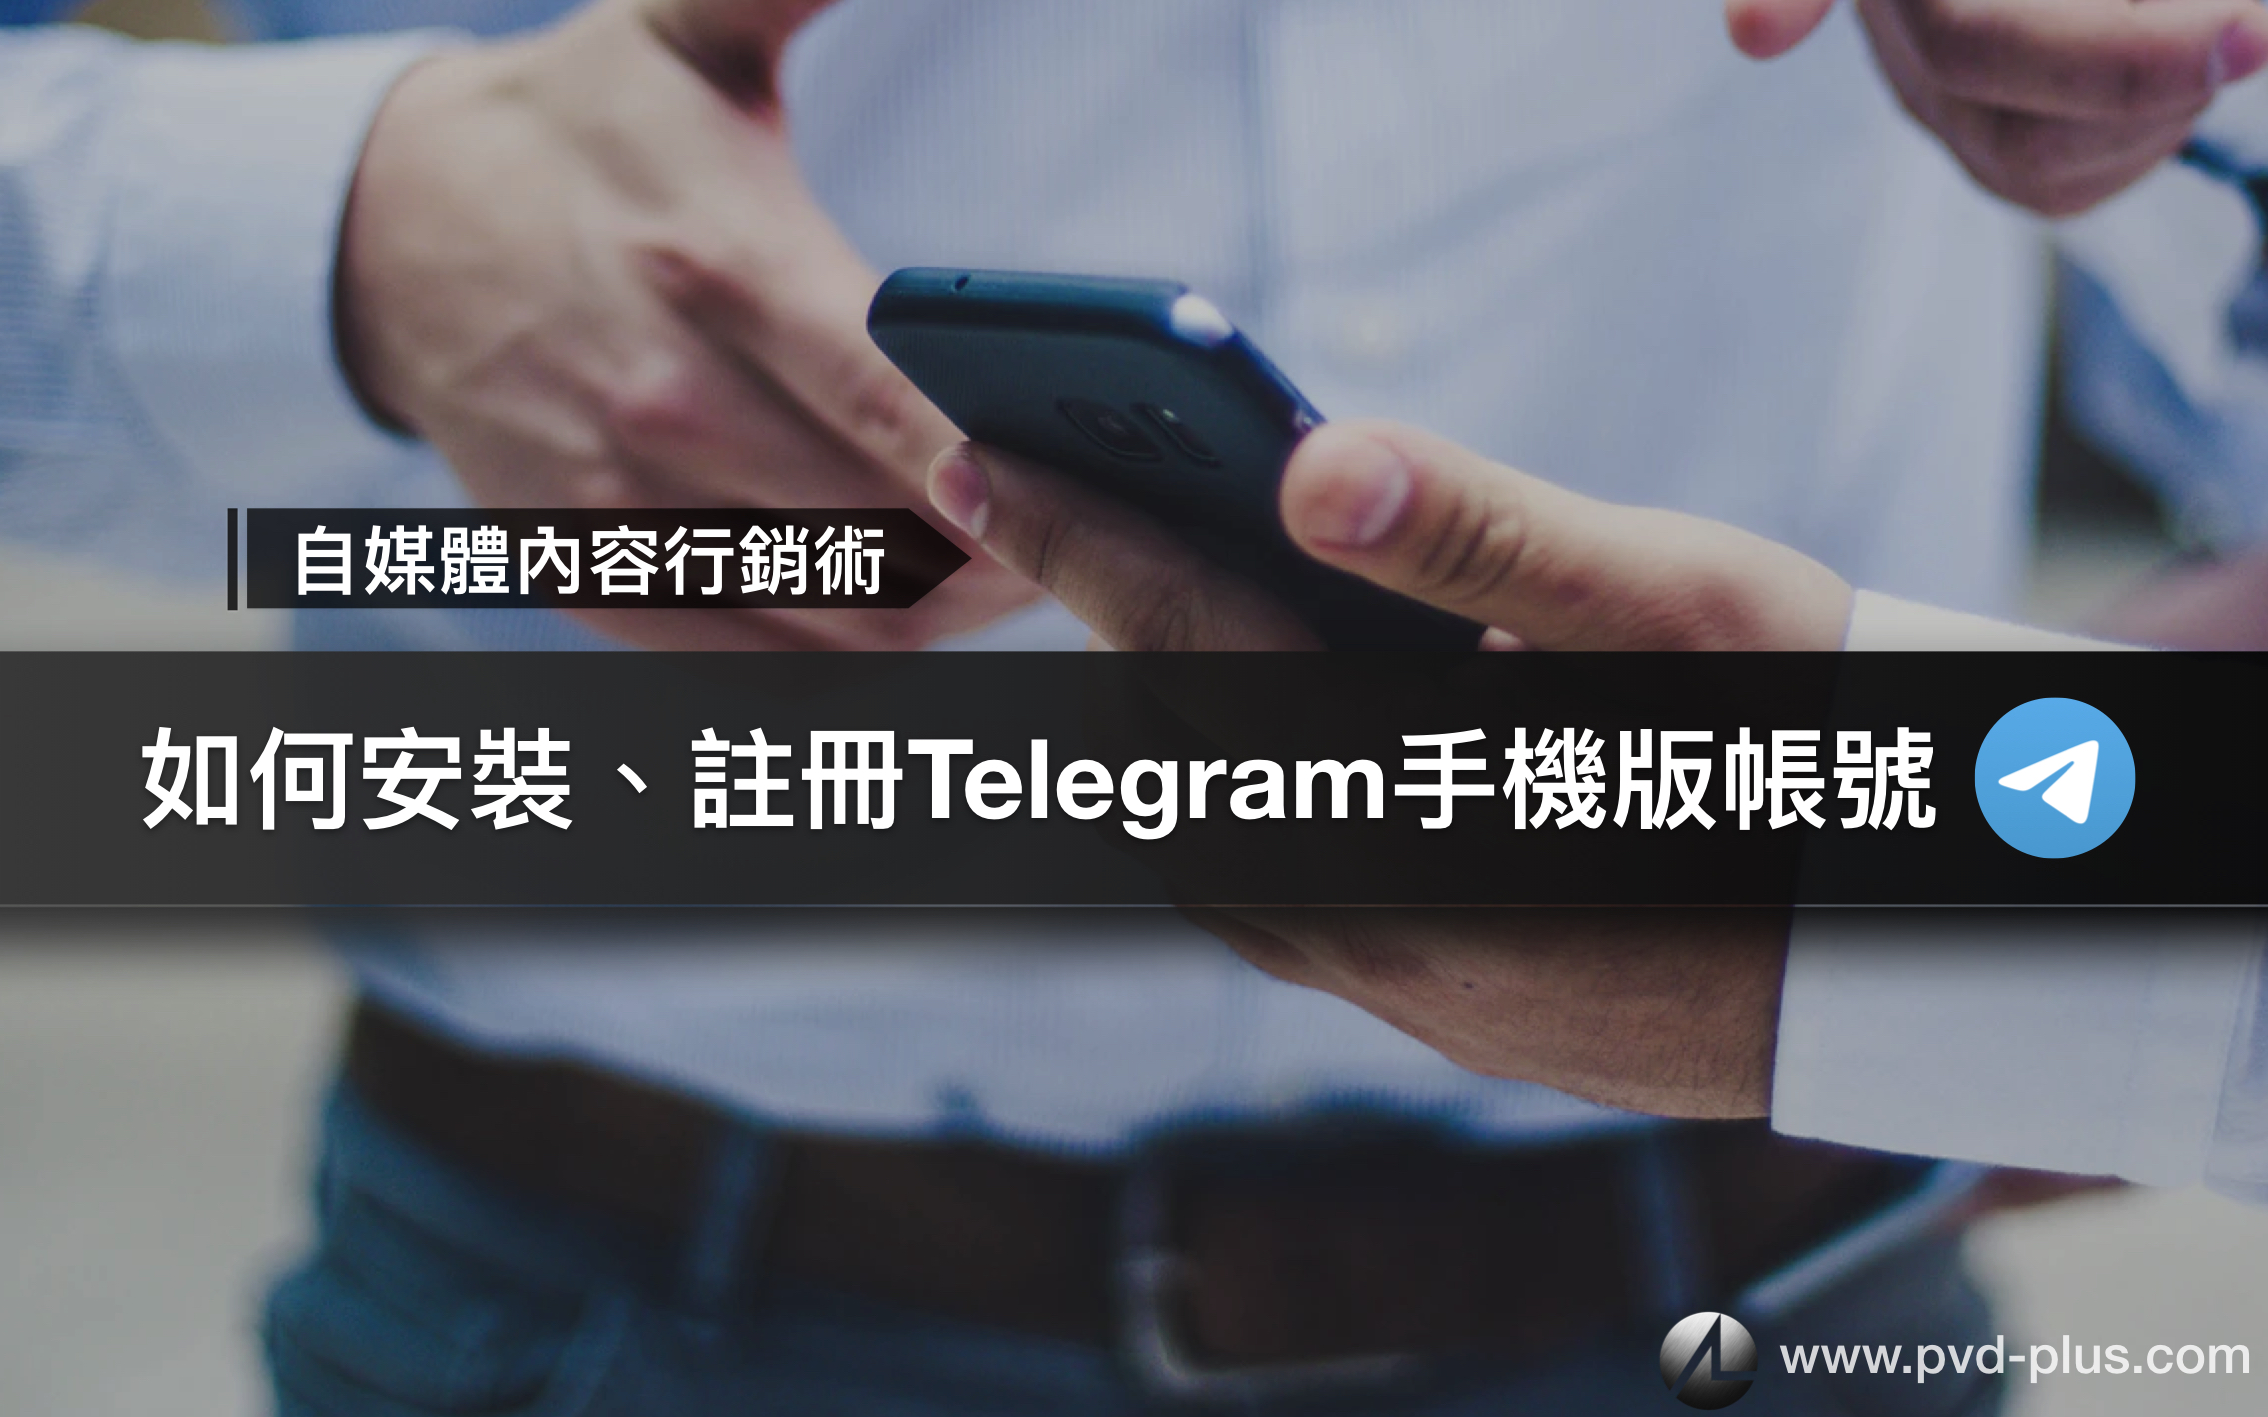 Telegram教學|新手如何安裝、電話驗證、註冊帳號、中文化